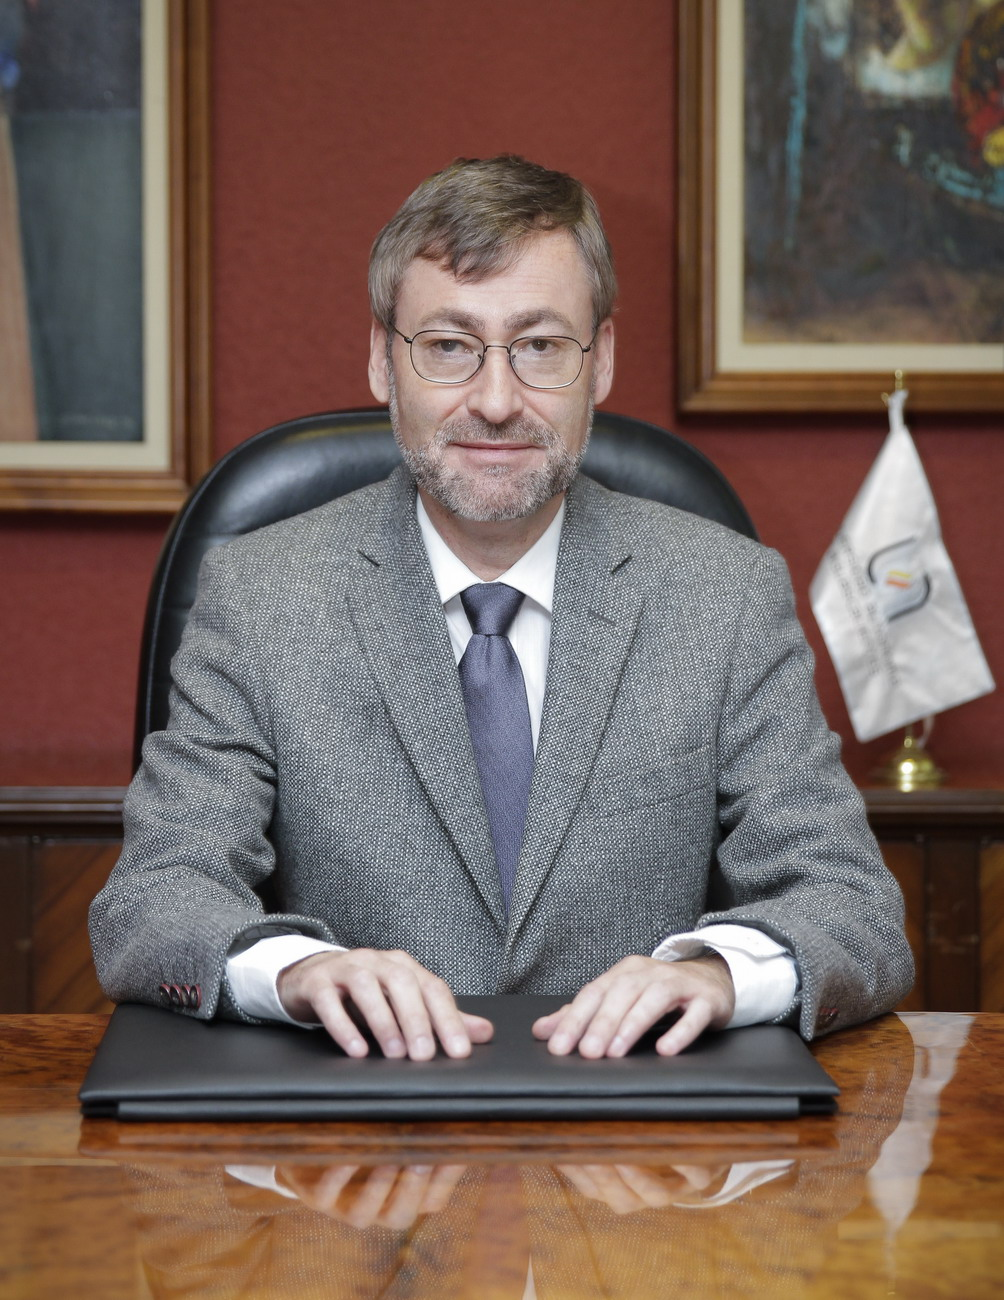 Dr. Francisco Javier Avelar González